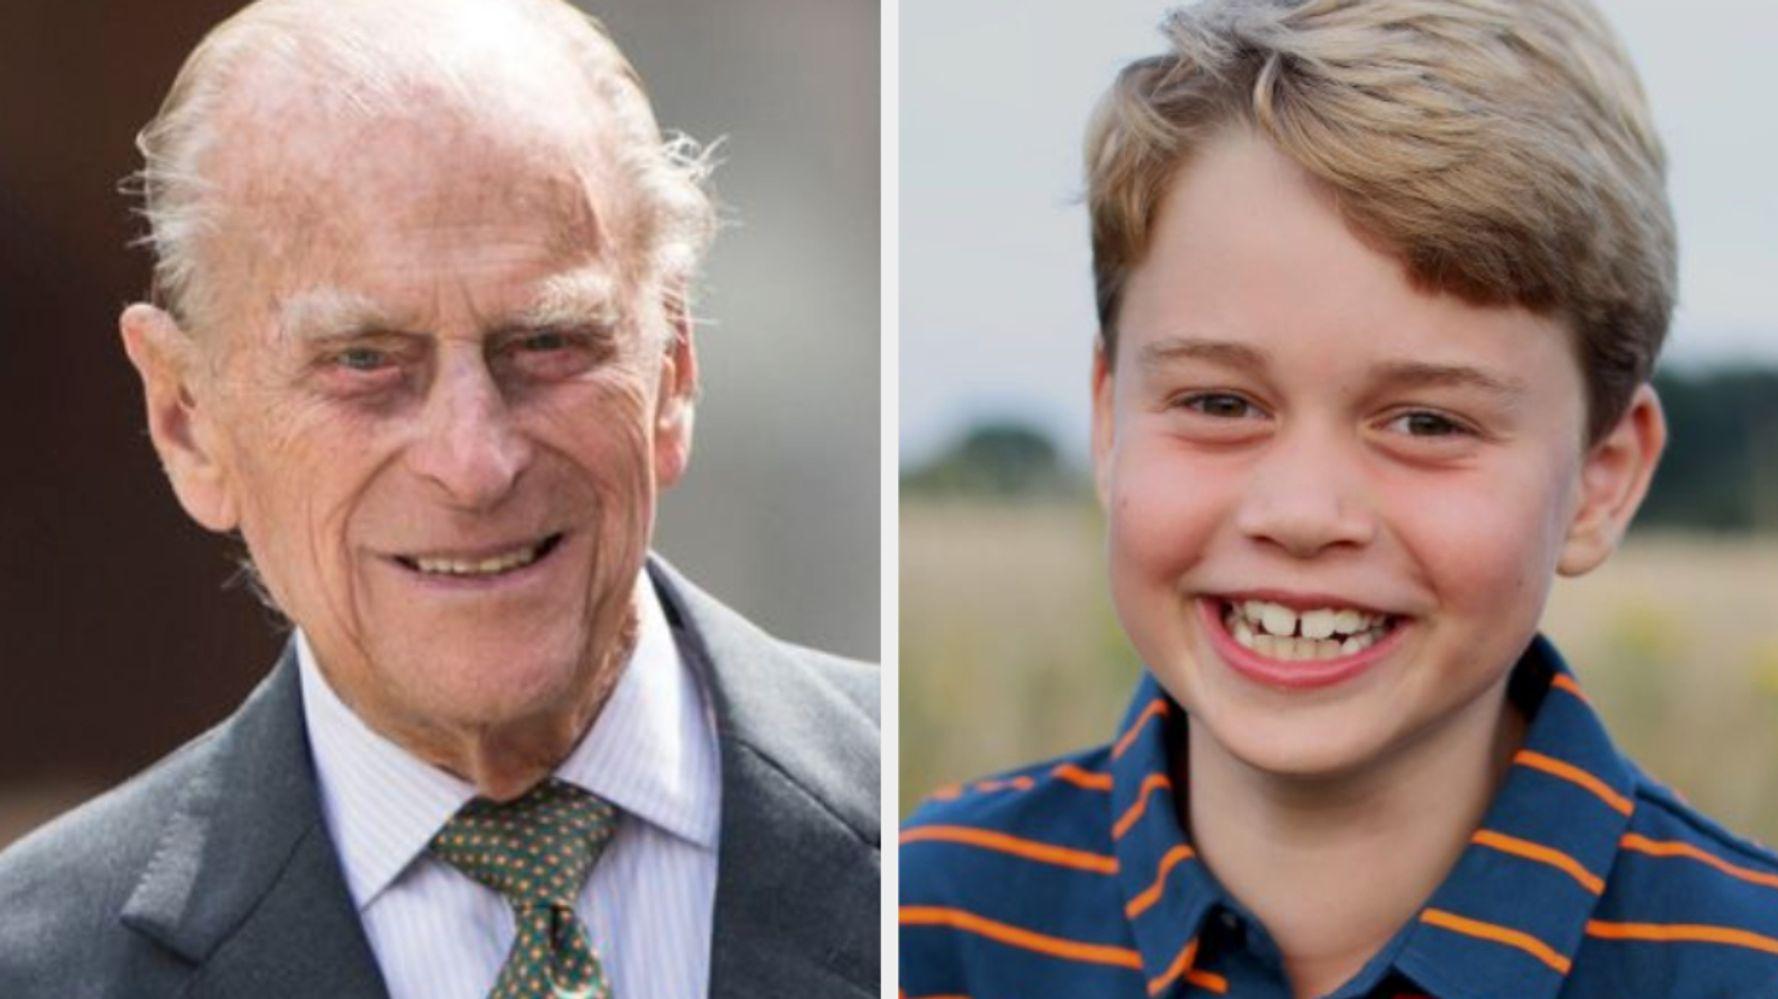 Prince George's Birthday Photo Pays Sweet Tribute To Duke Of Edinburgh